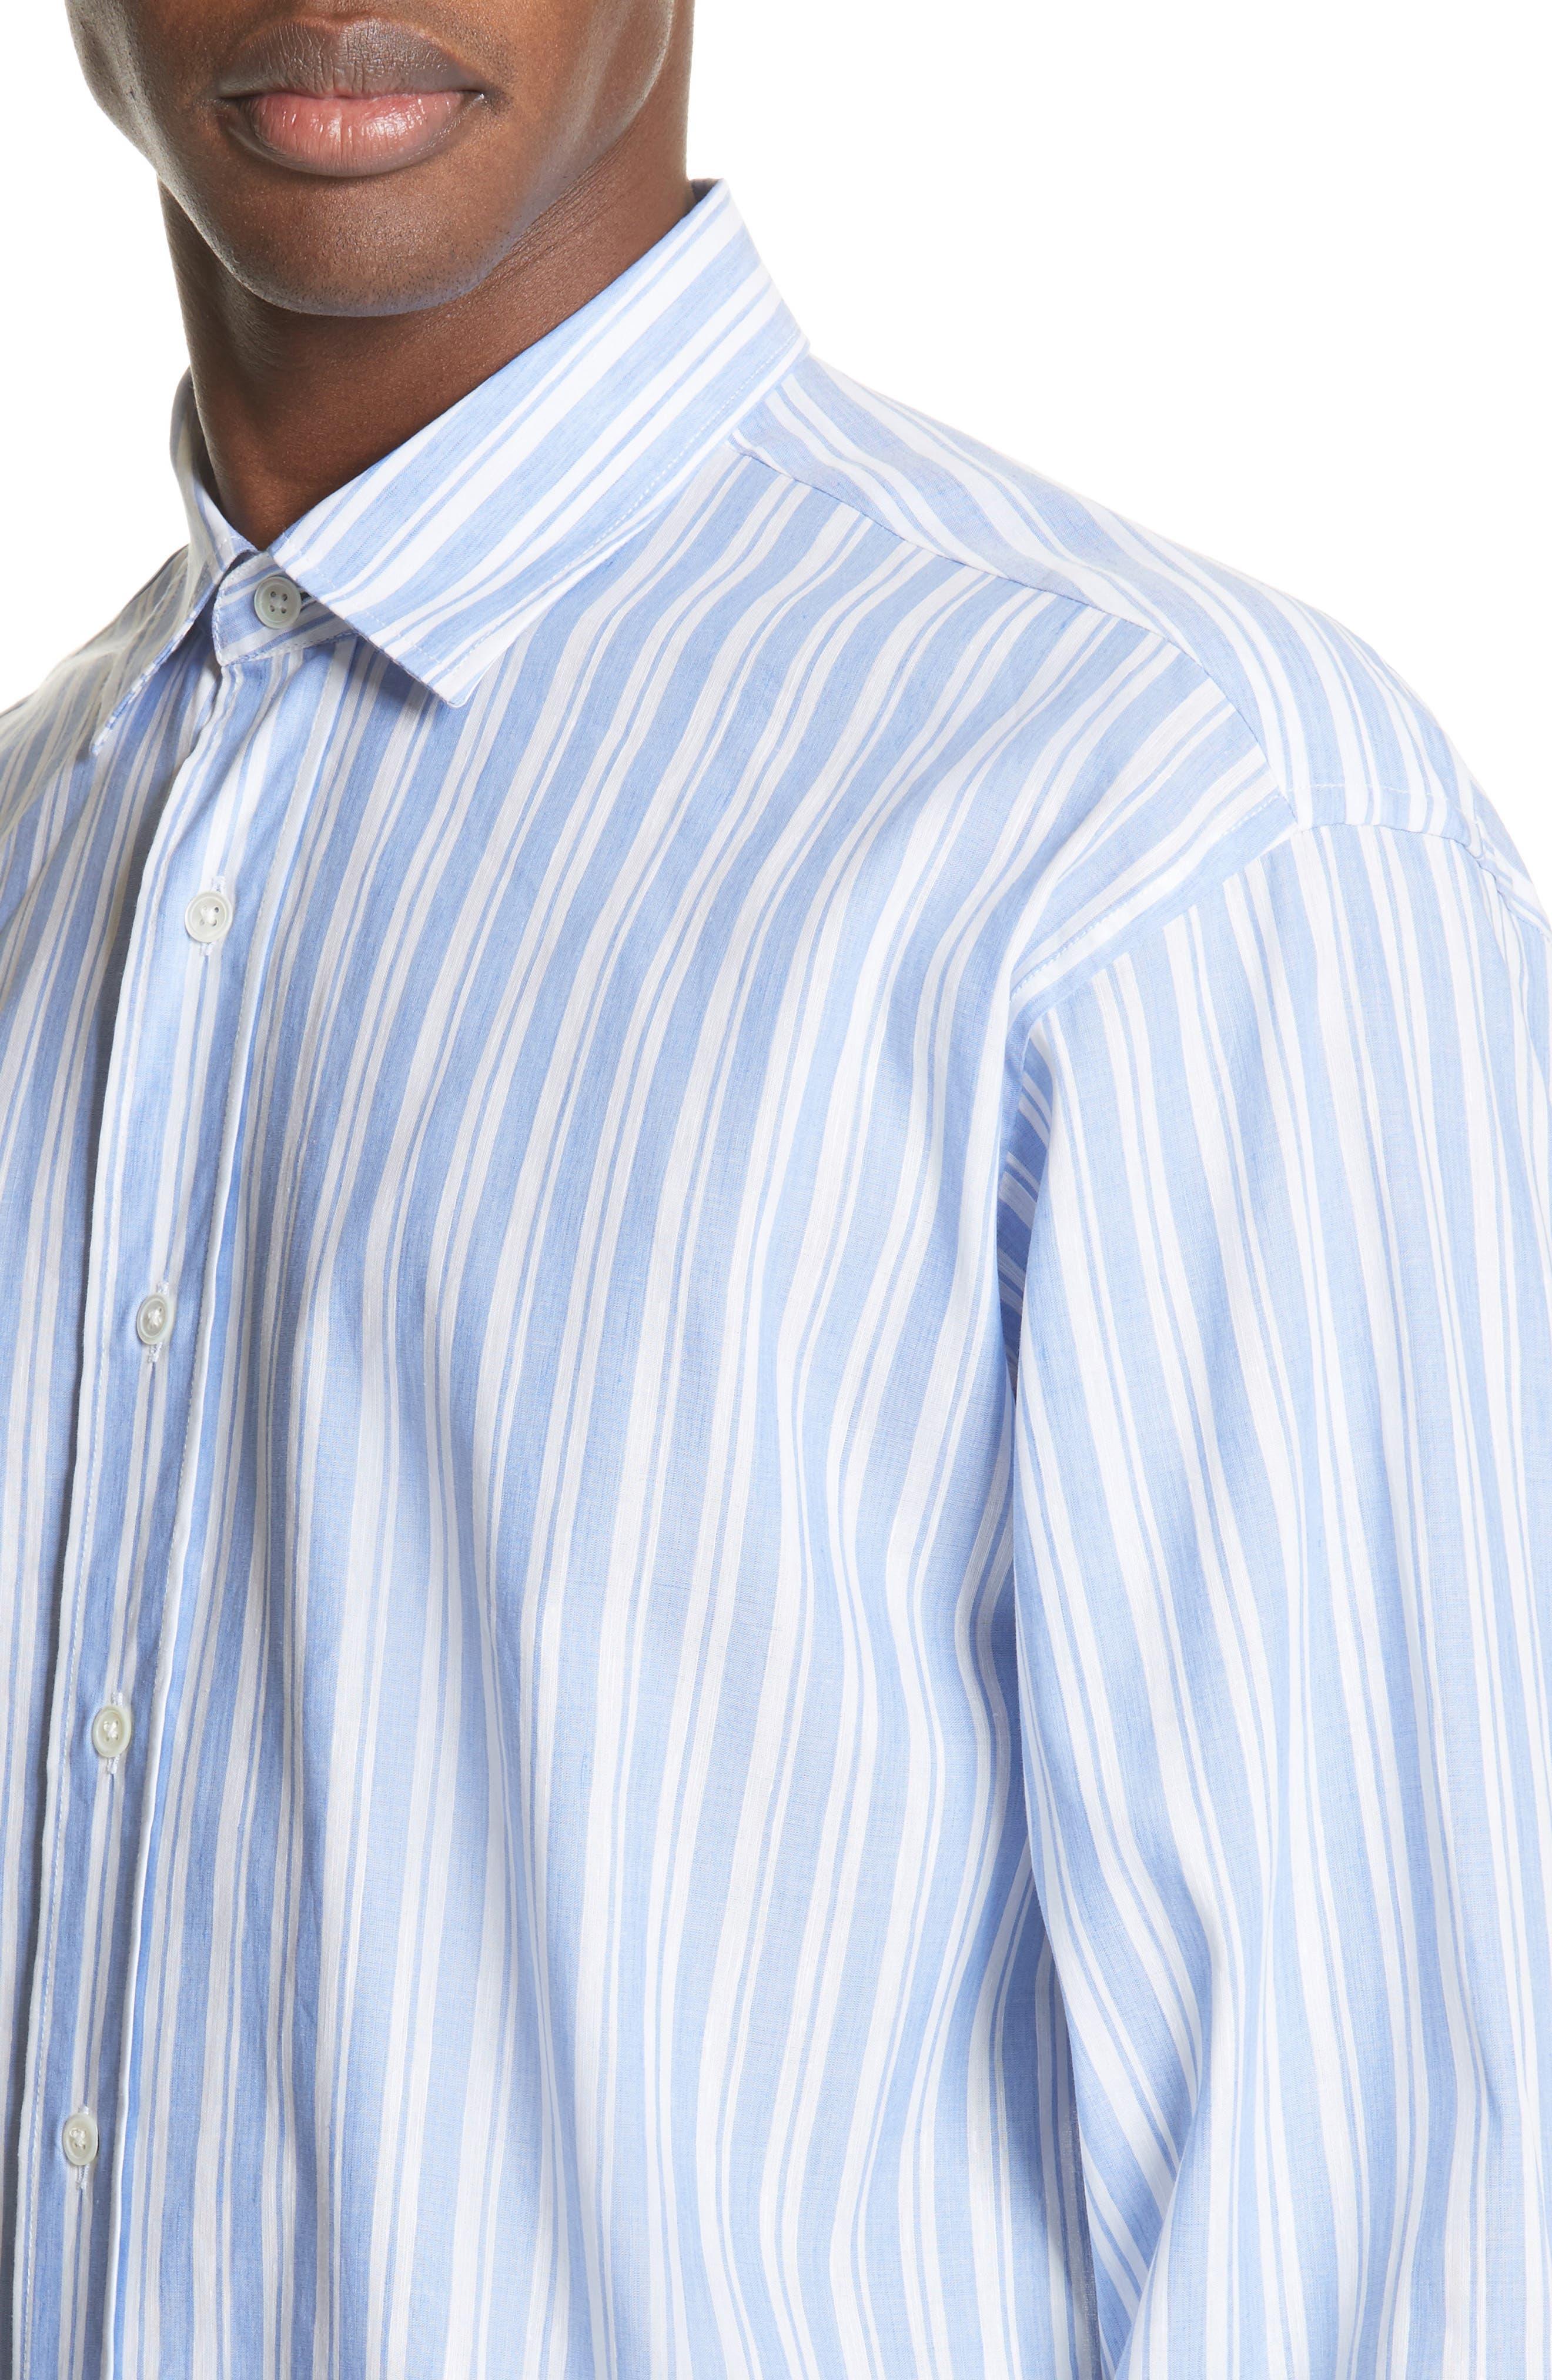 Oversized Stripe Chambray Shirt,                             Alternate thumbnail 4, color,                             460